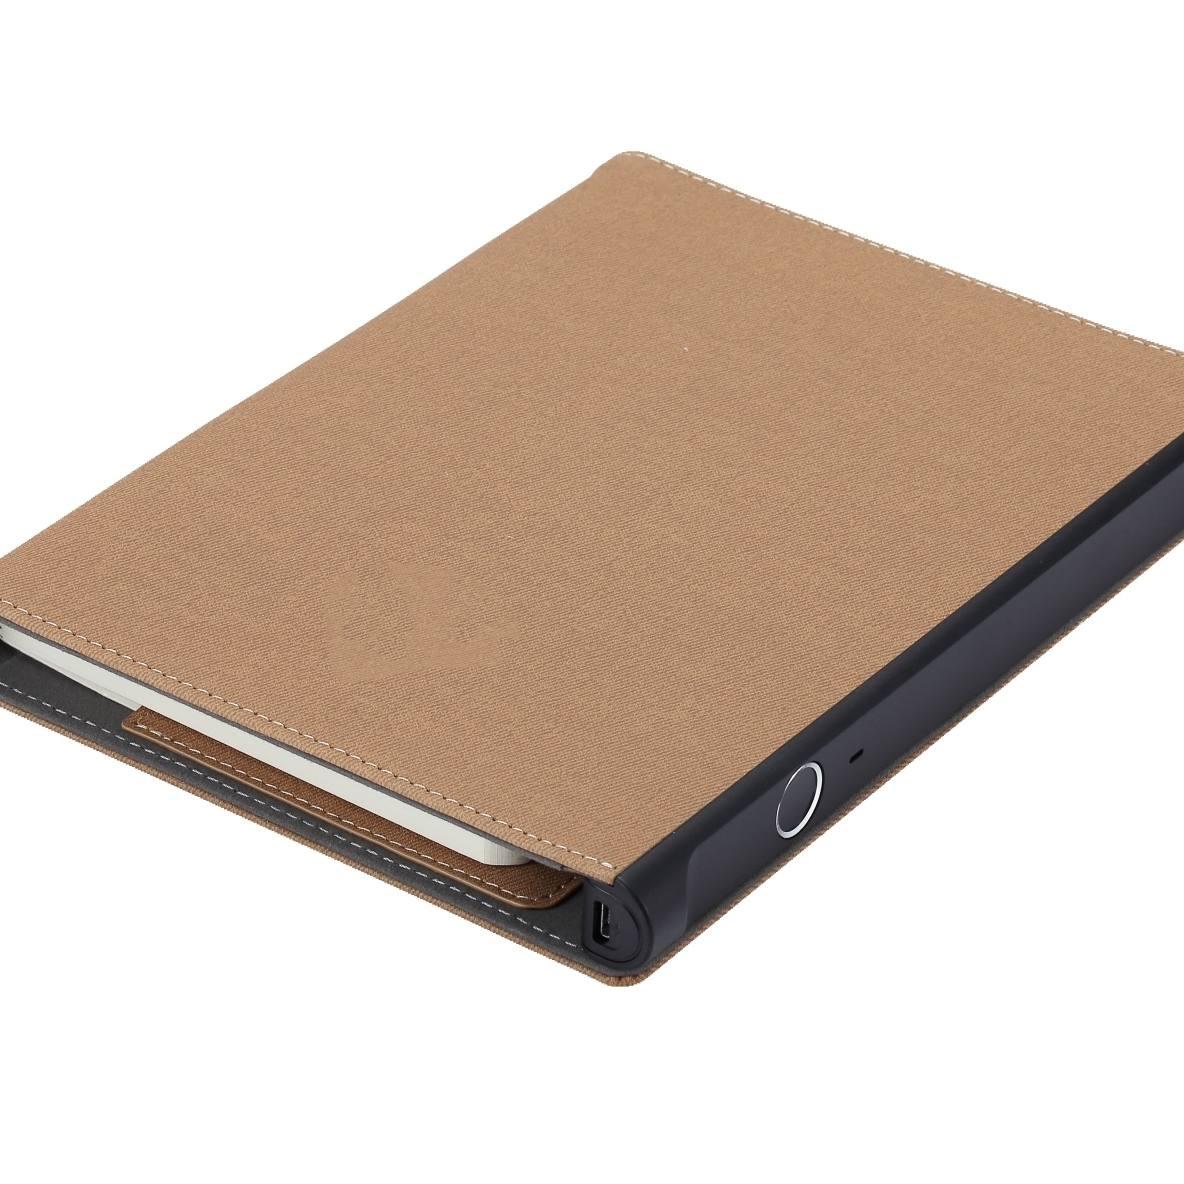 Khaki fingerprint Smartbook | Midas Touch